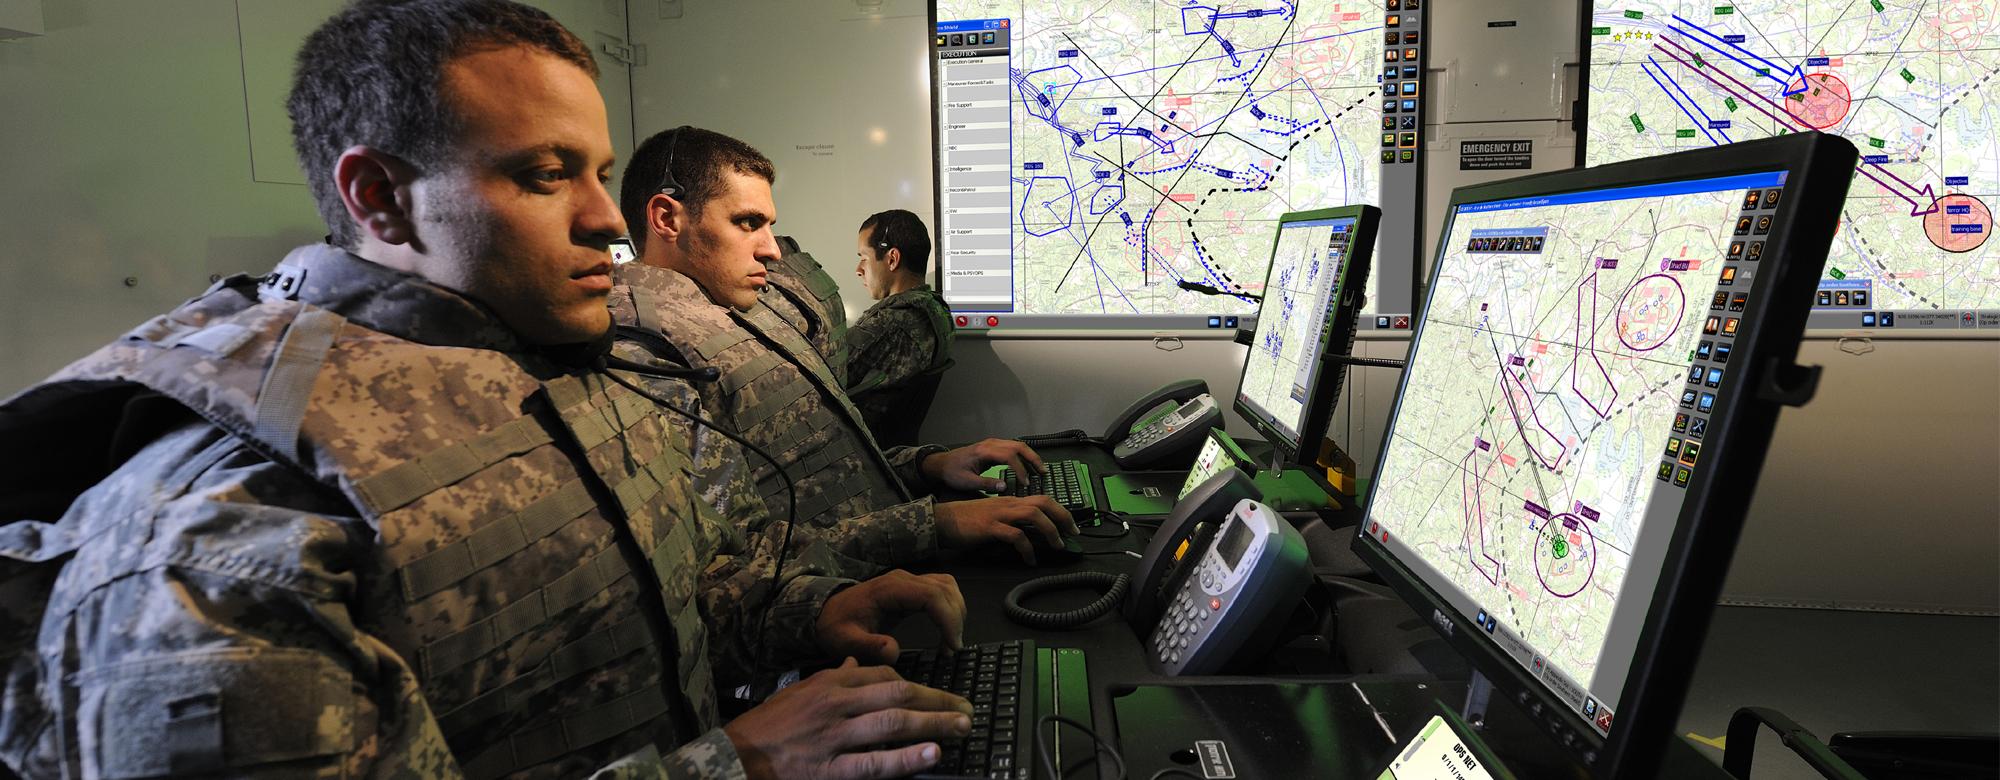 International Defense Electronics Company